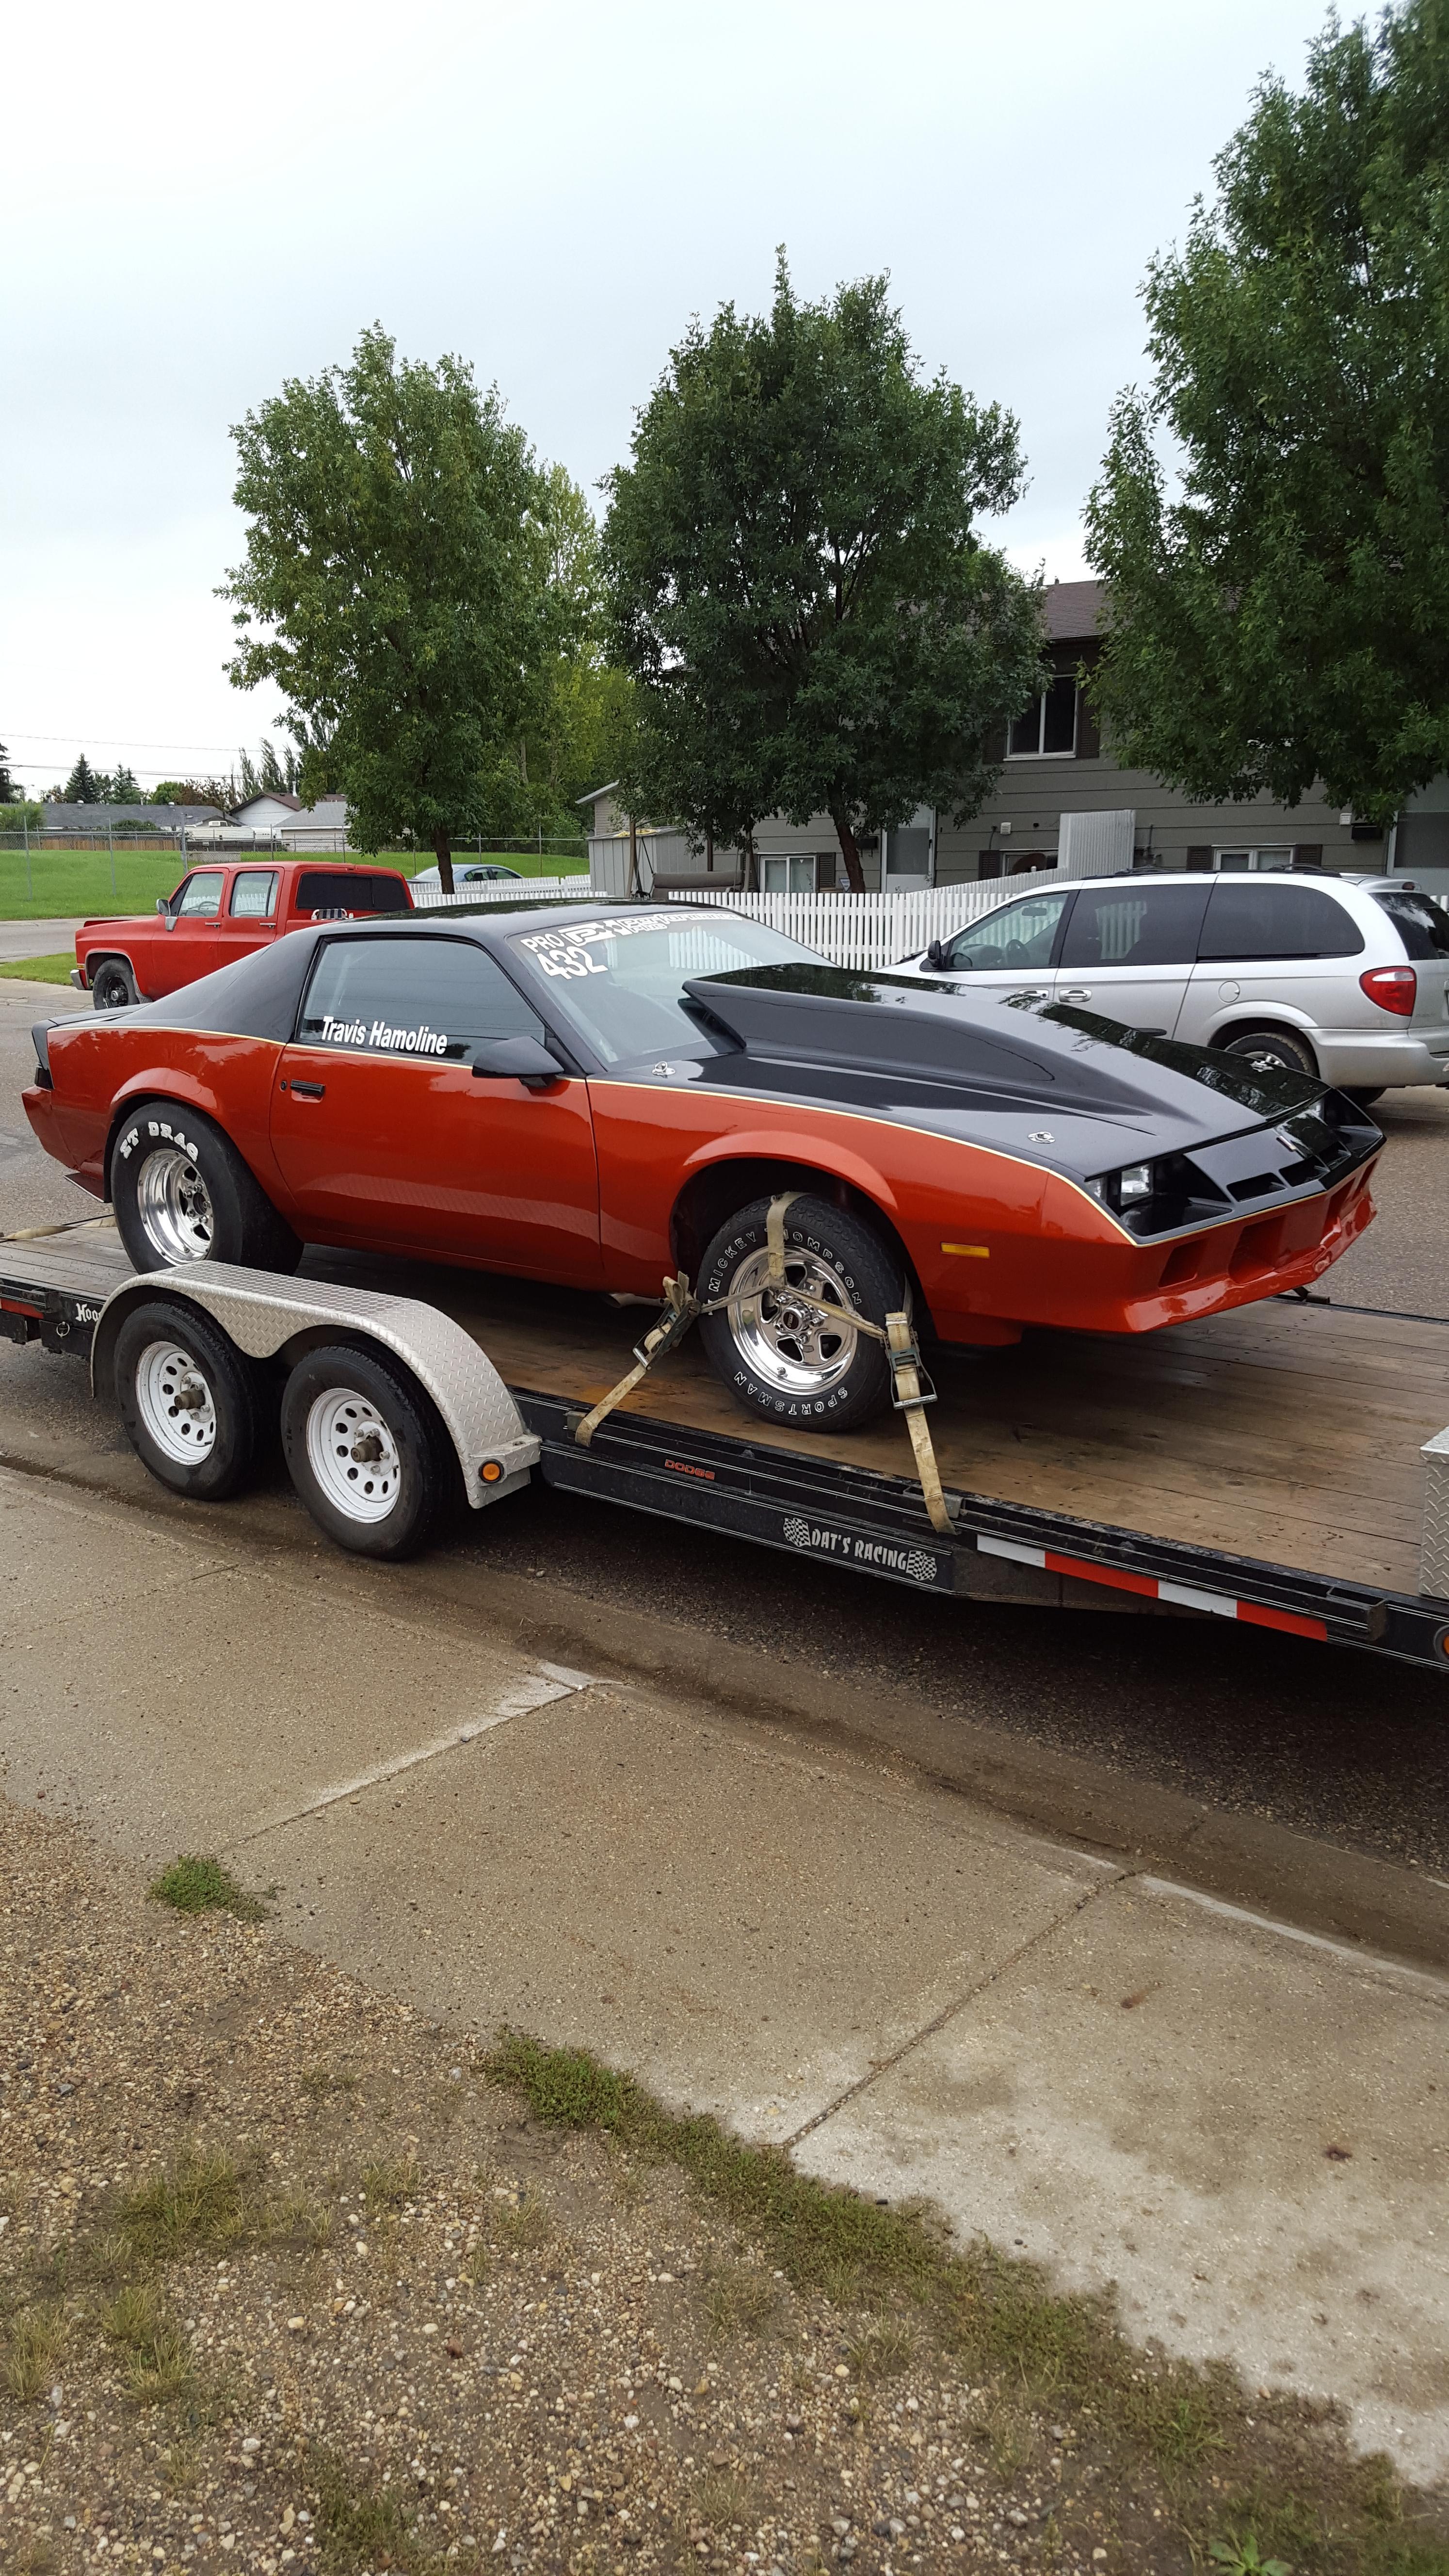 1984 Camaro Drag Car For Sale - $18000